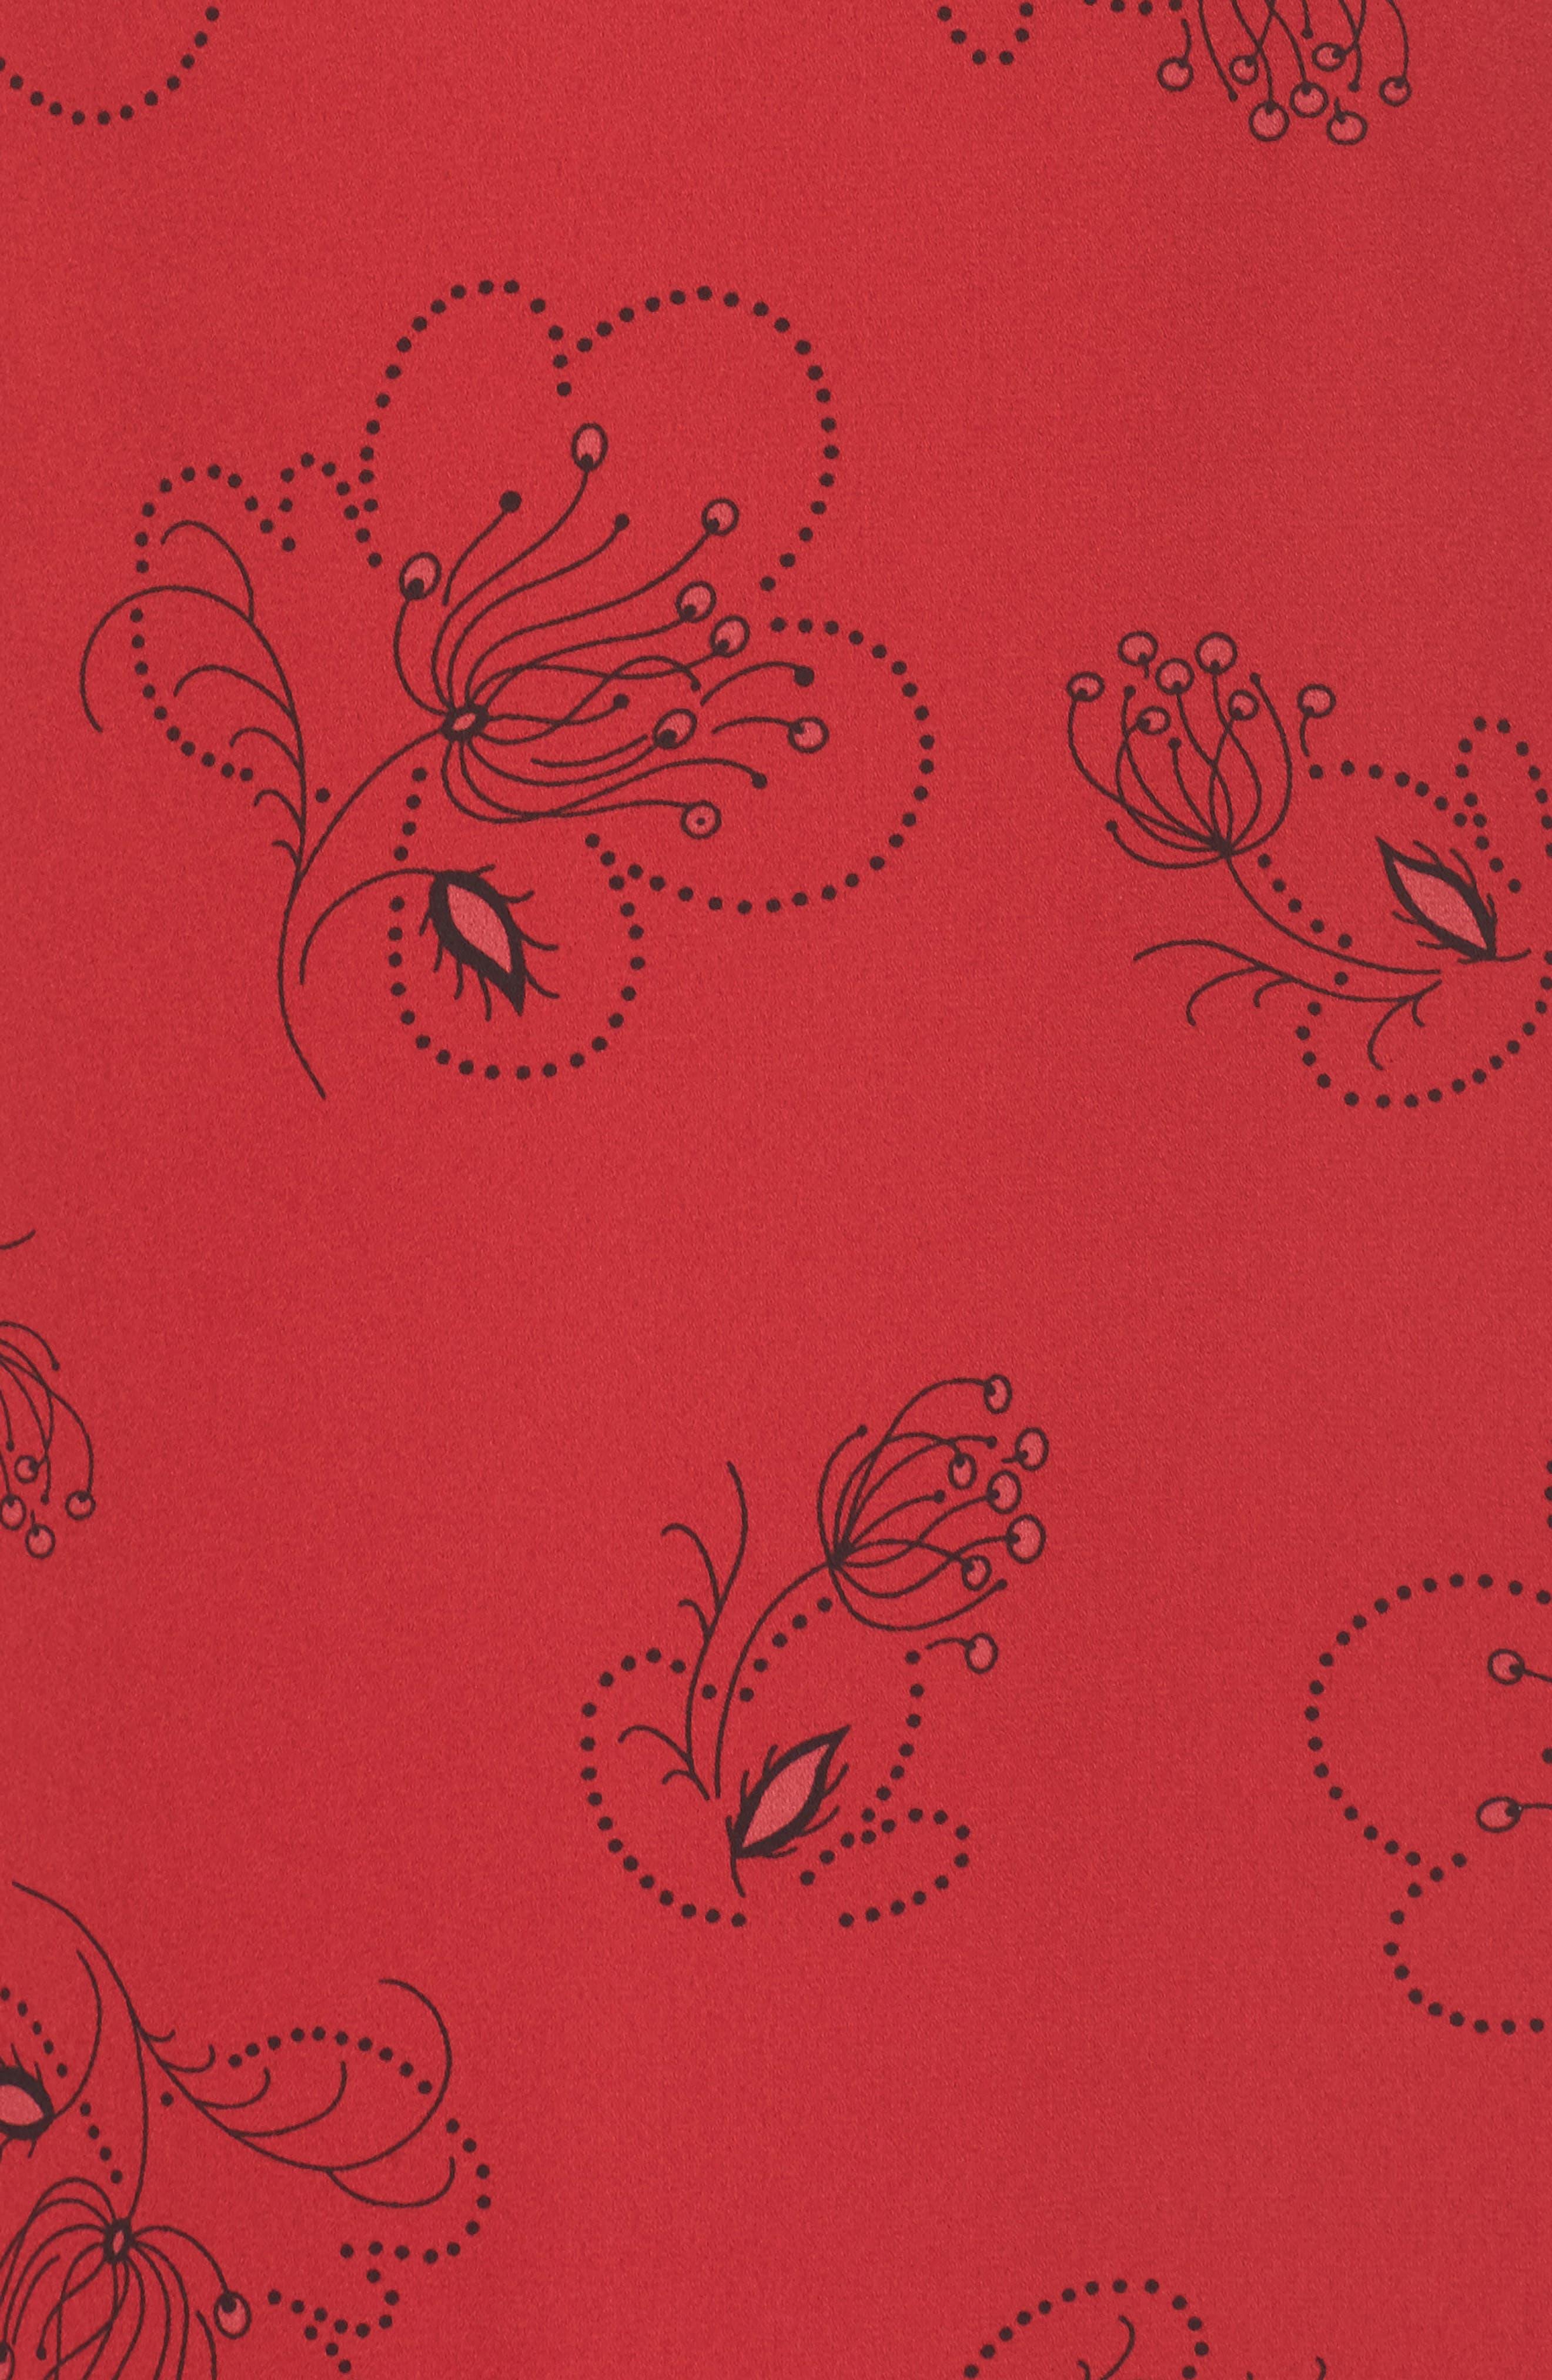 Lizzie Shift Dress,                             Alternate thumbnail 5, color,                             Pomegranate Multi